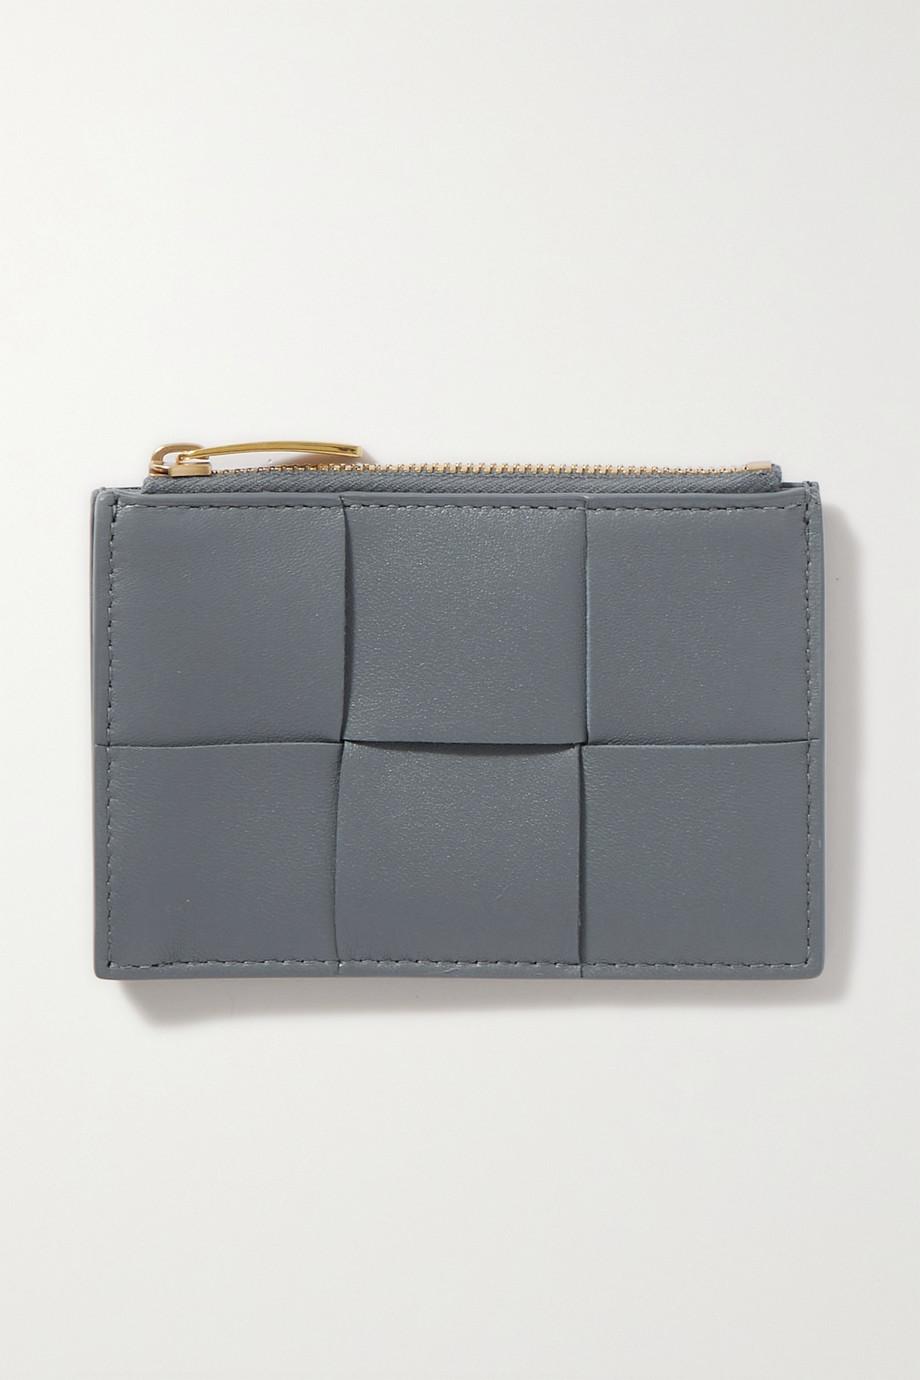 Bottega Veneta Cassette intrecciato leather cardholder